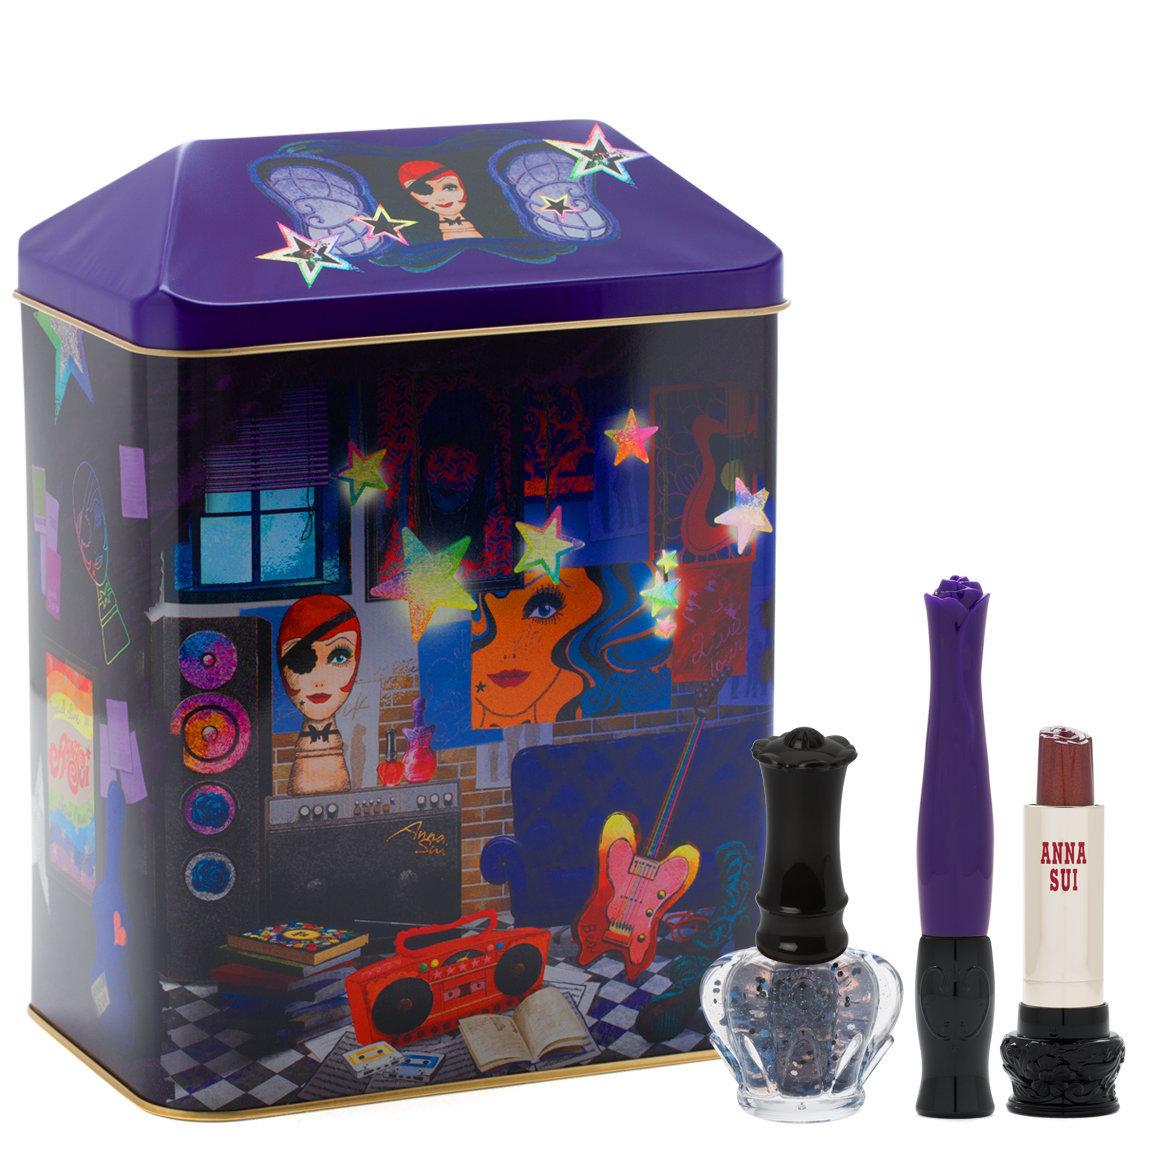 Anna Sui Makeup Coffret 03 Bea alternative view 1 - product swatch.